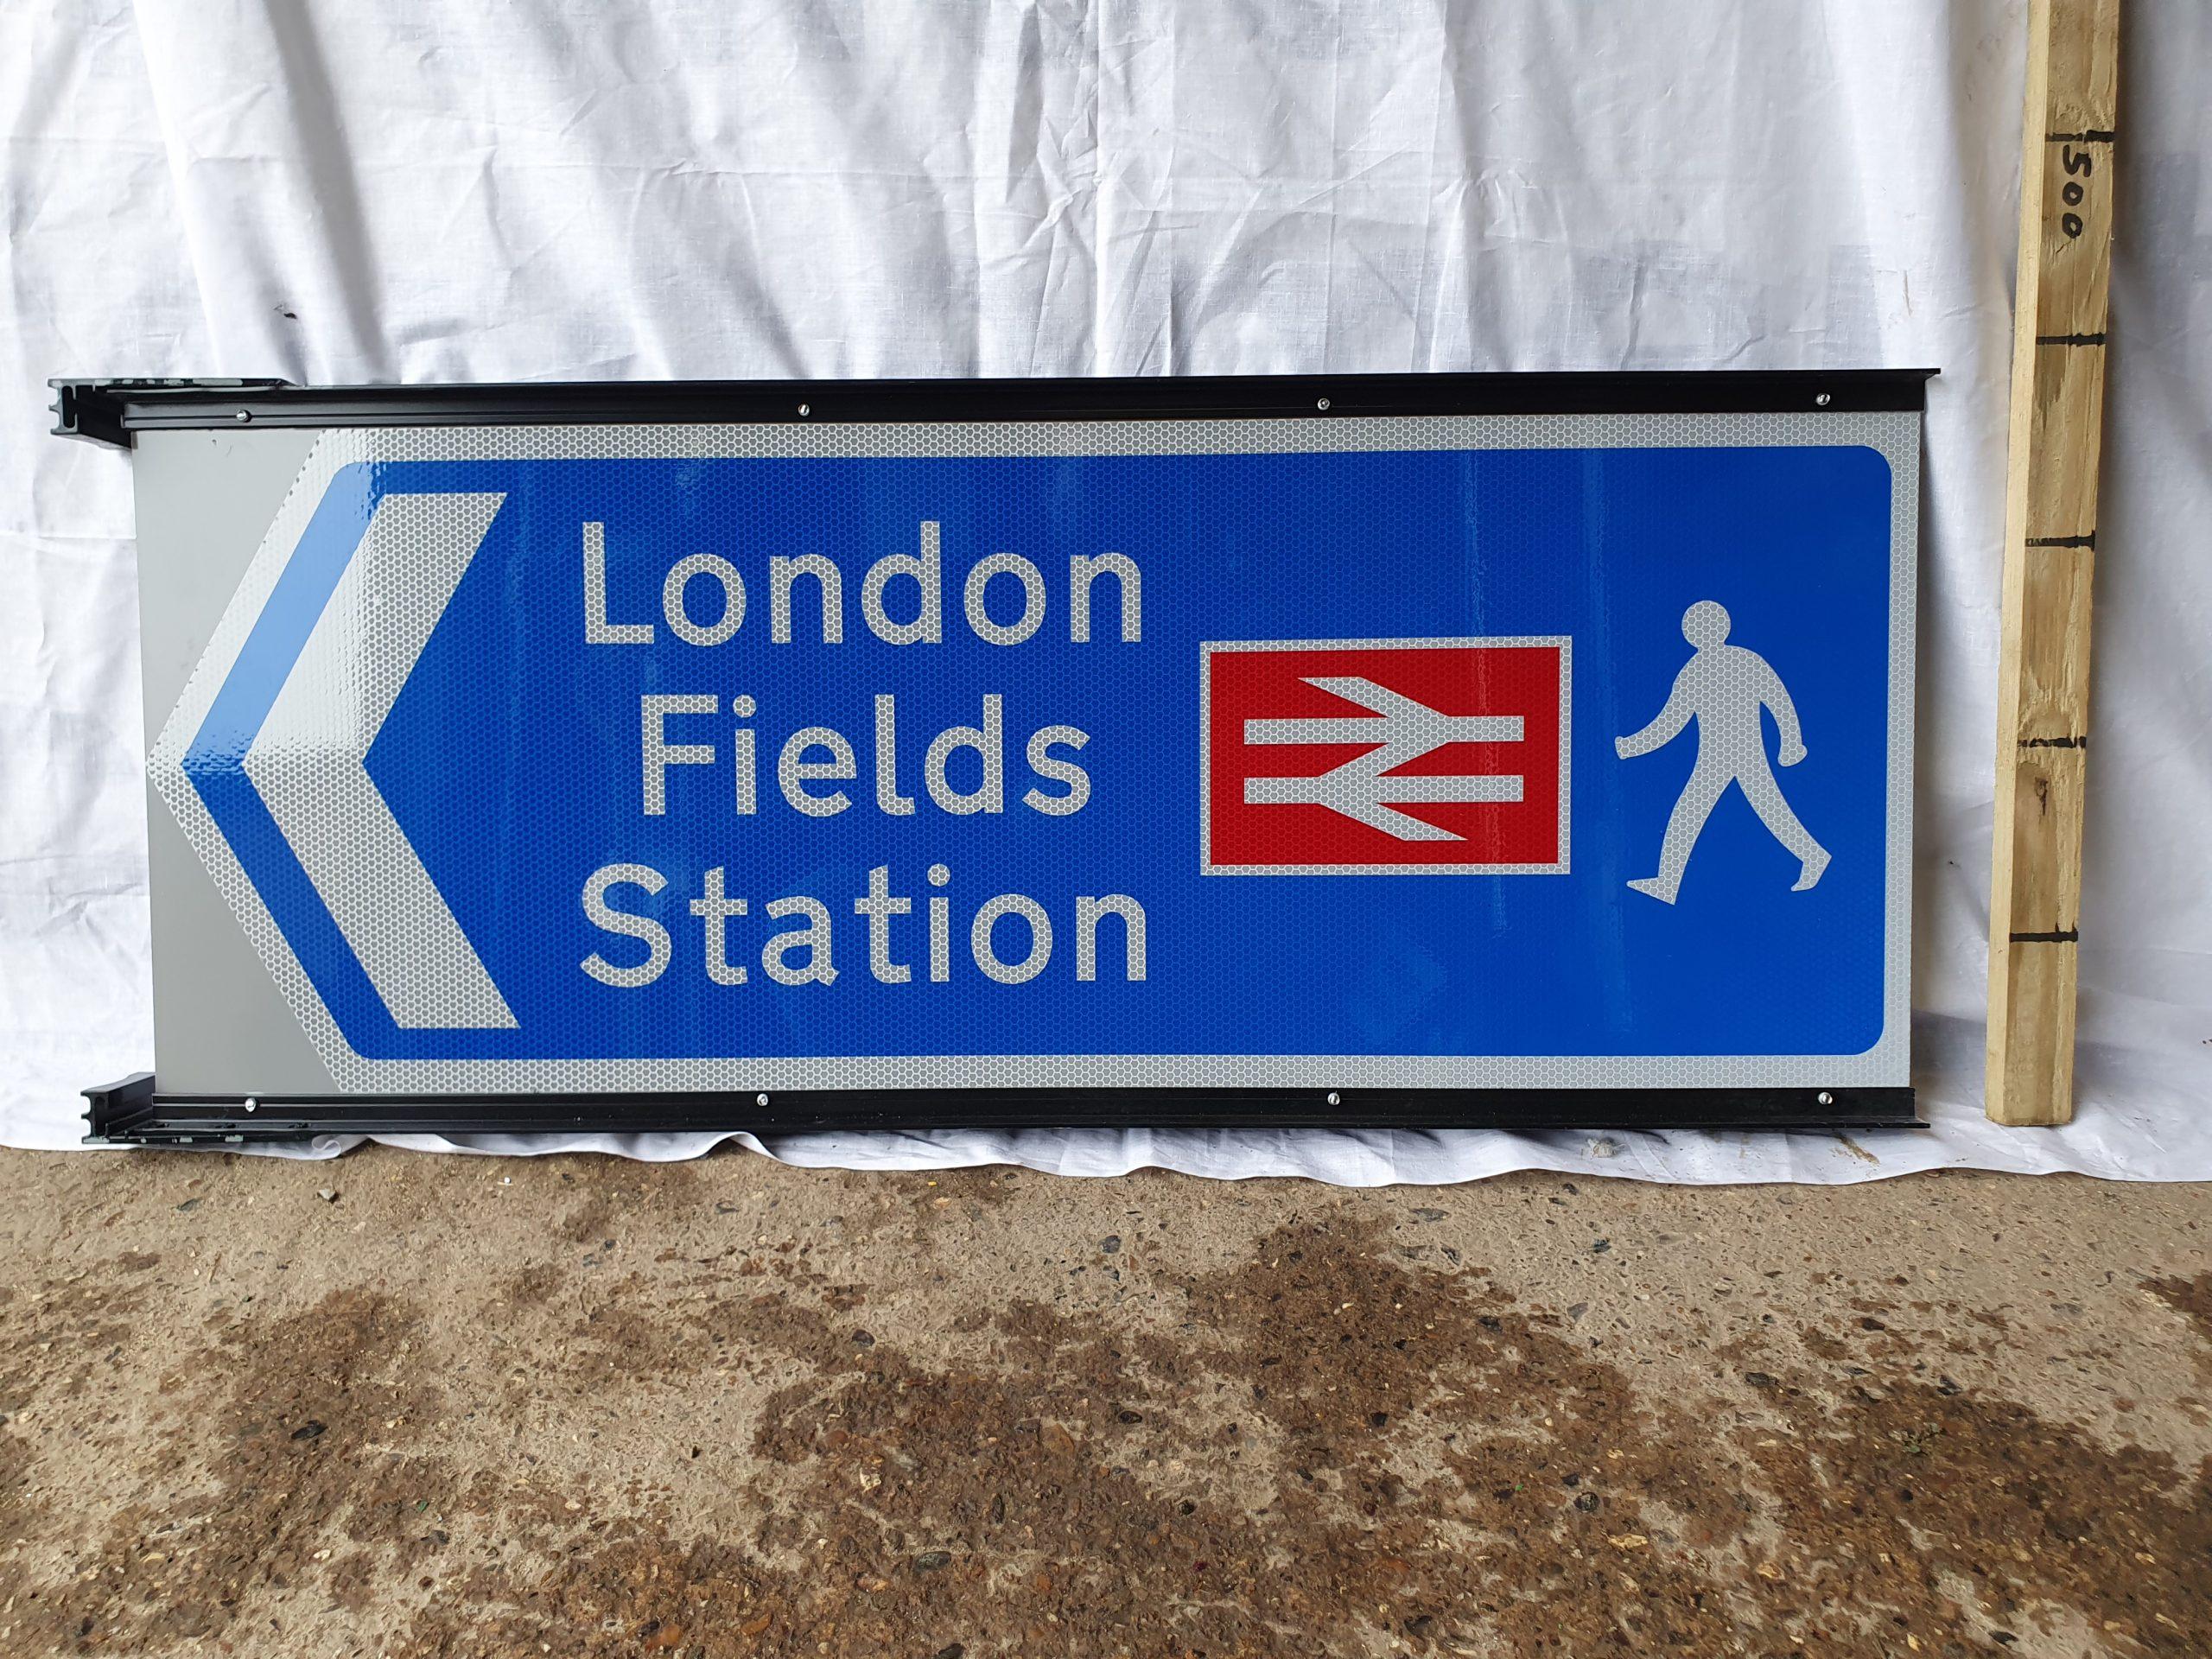 London Fields Station Network Rail Railway Station Sign